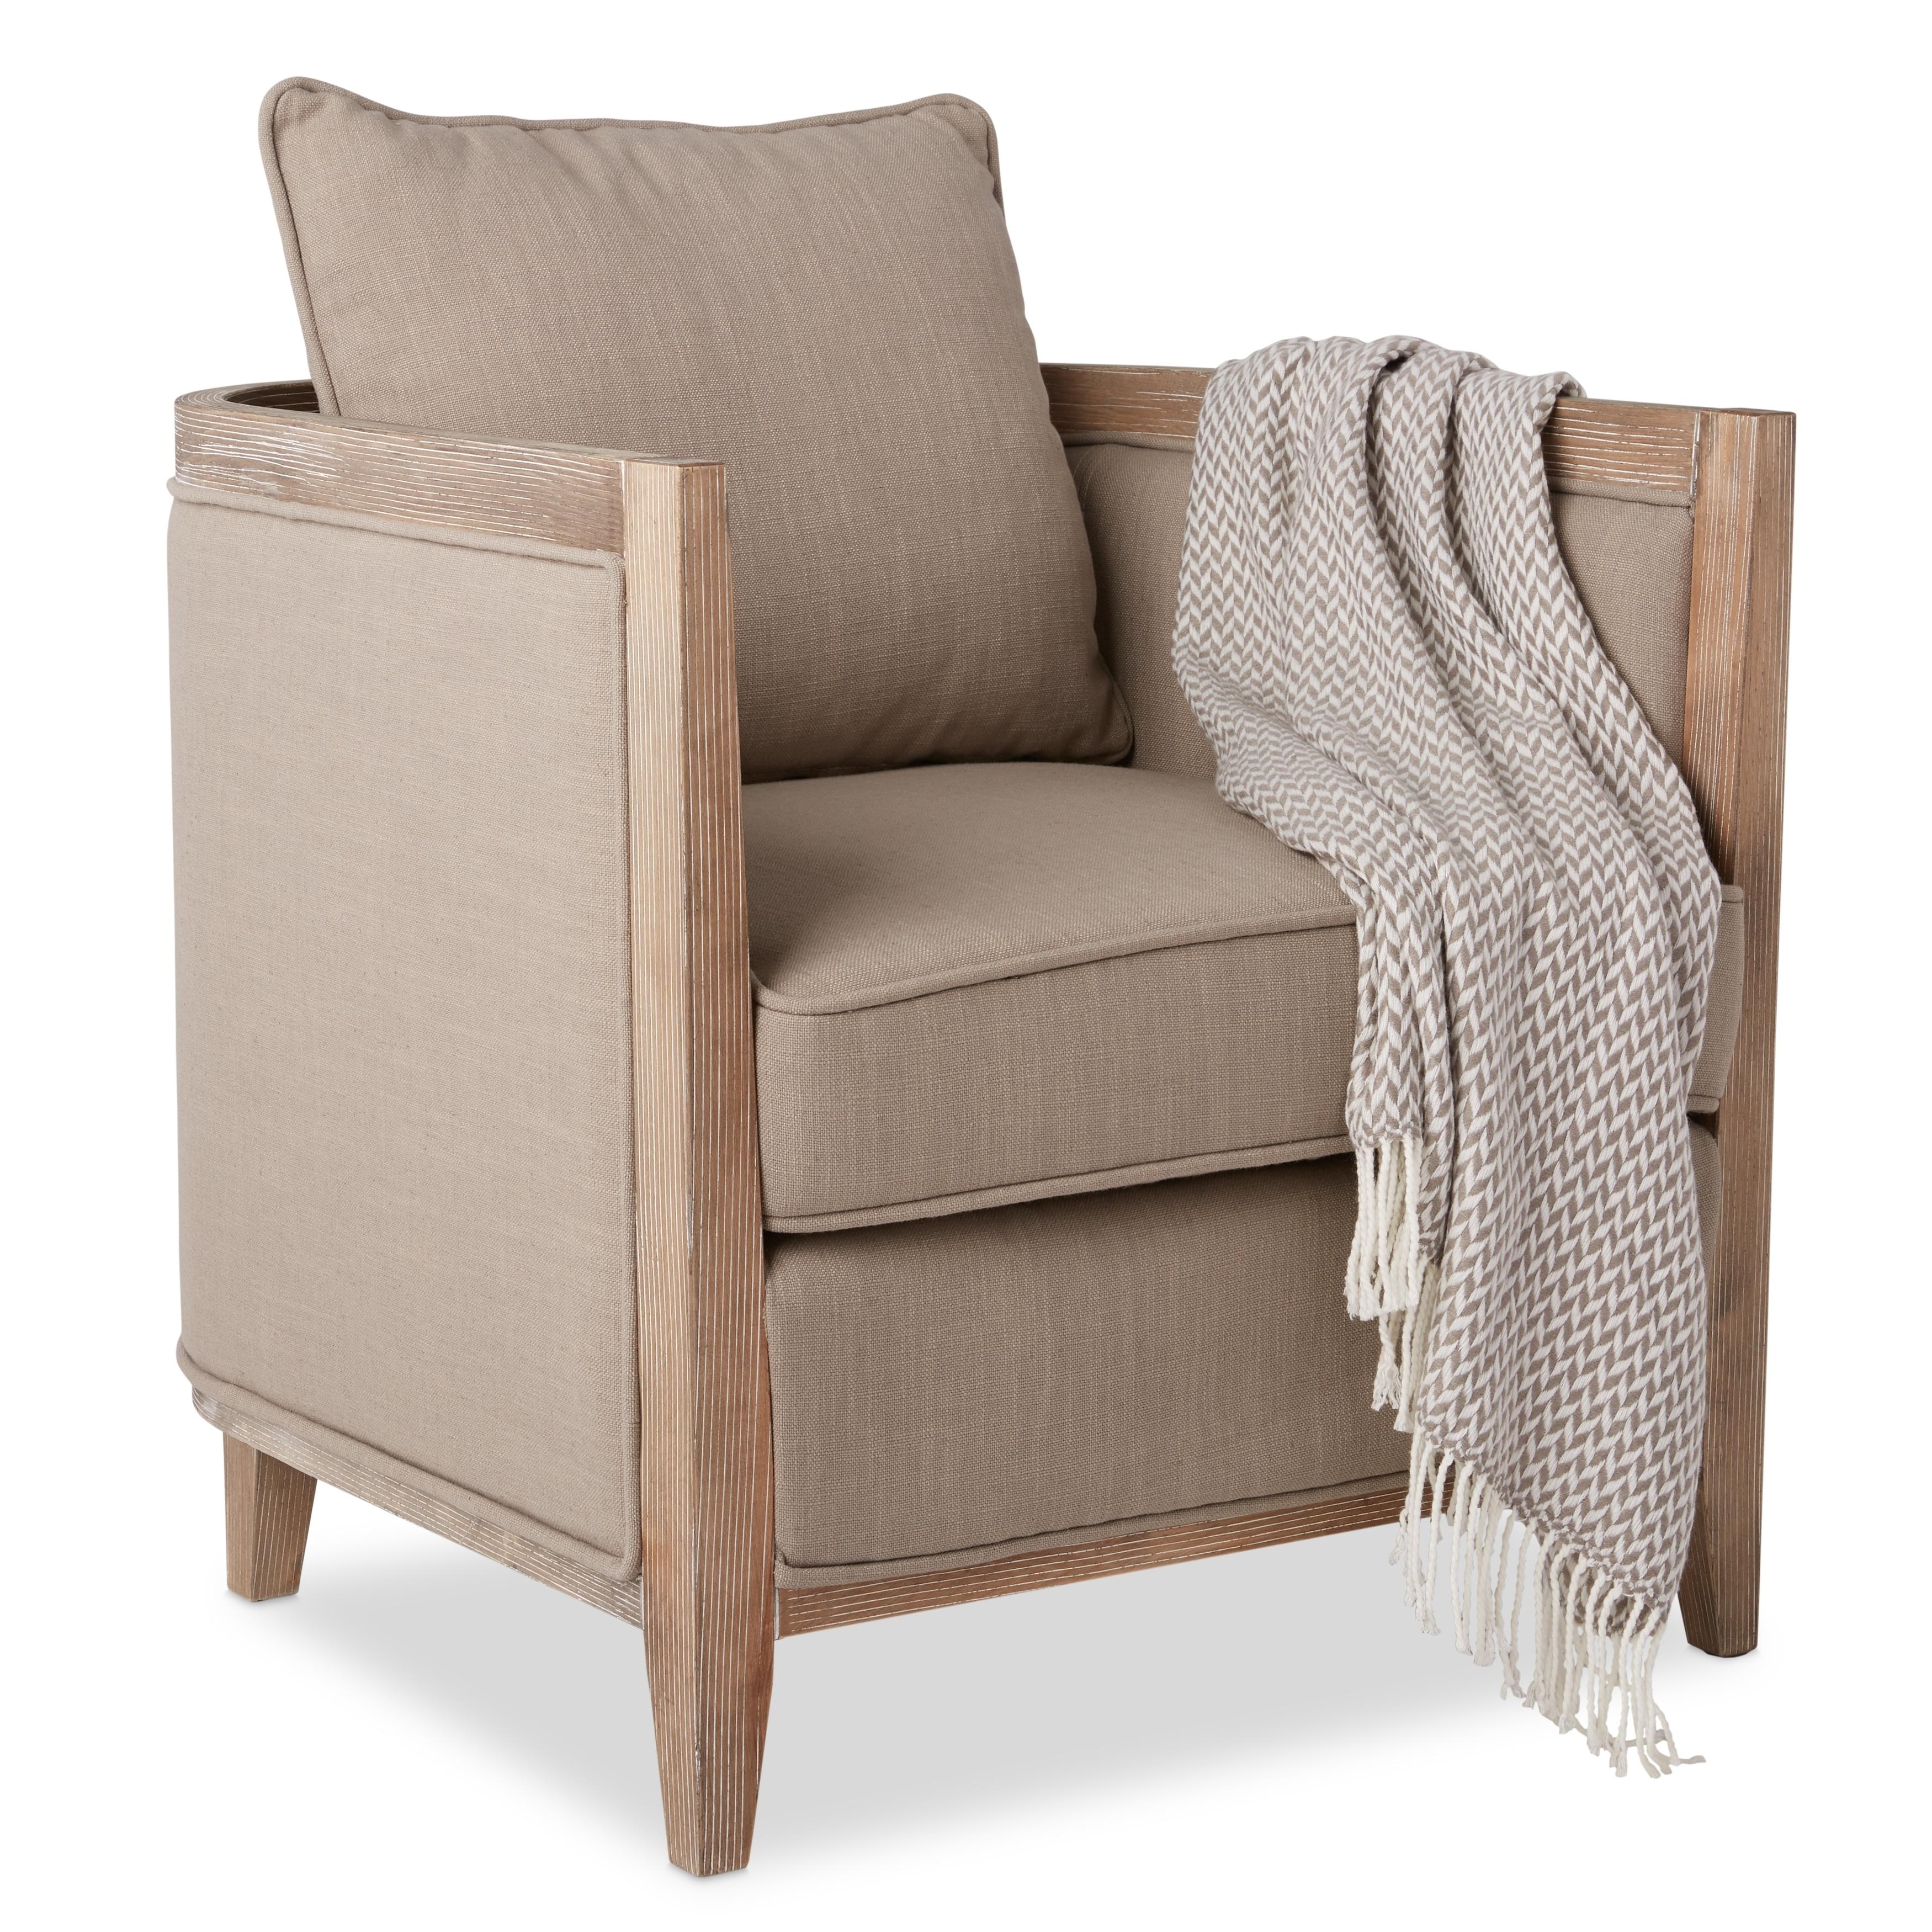 carbon loft elliot beige linen lounge chair free shipping today